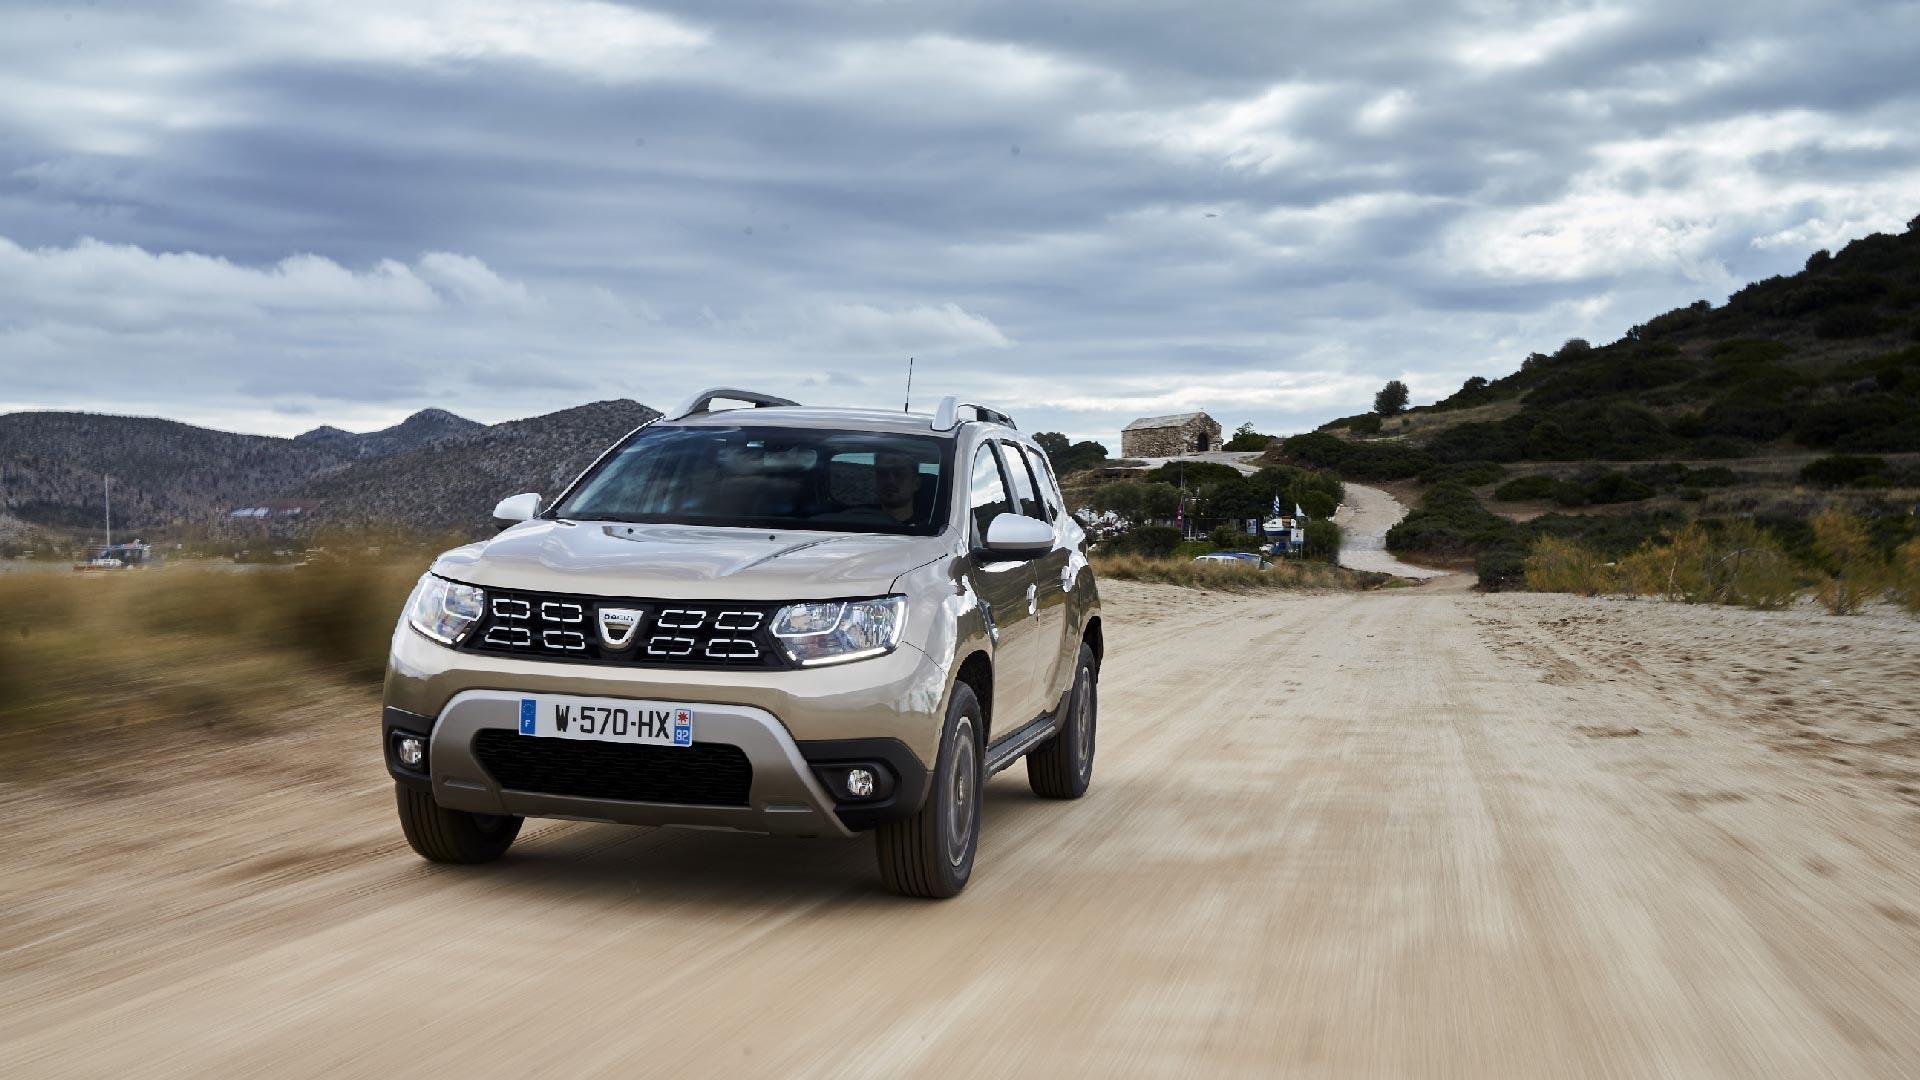 Dacia Duster i fart grå